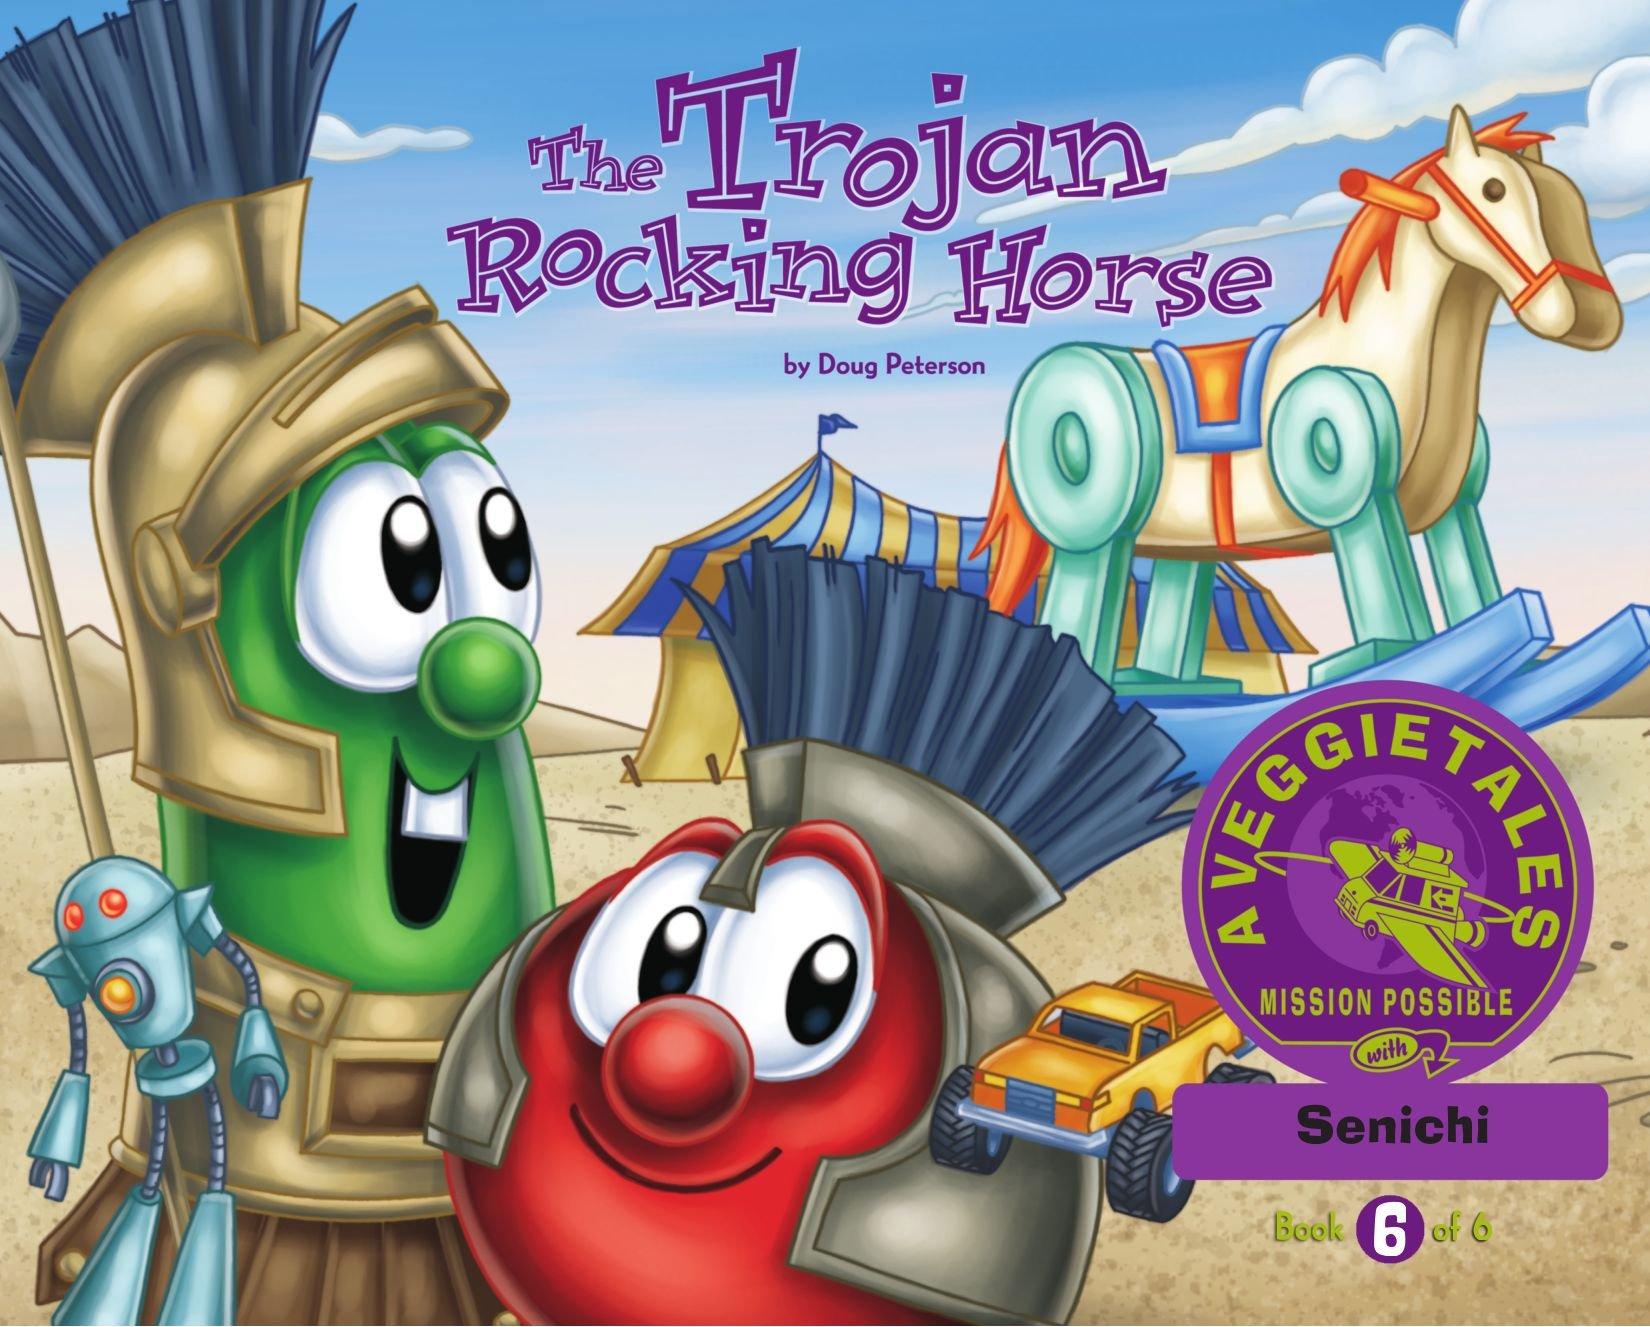 The Trojan Rocking Horse - VeggieTales Mission Possible Adventure Series #6: Personalized for Senichi (Girl) pdf epub